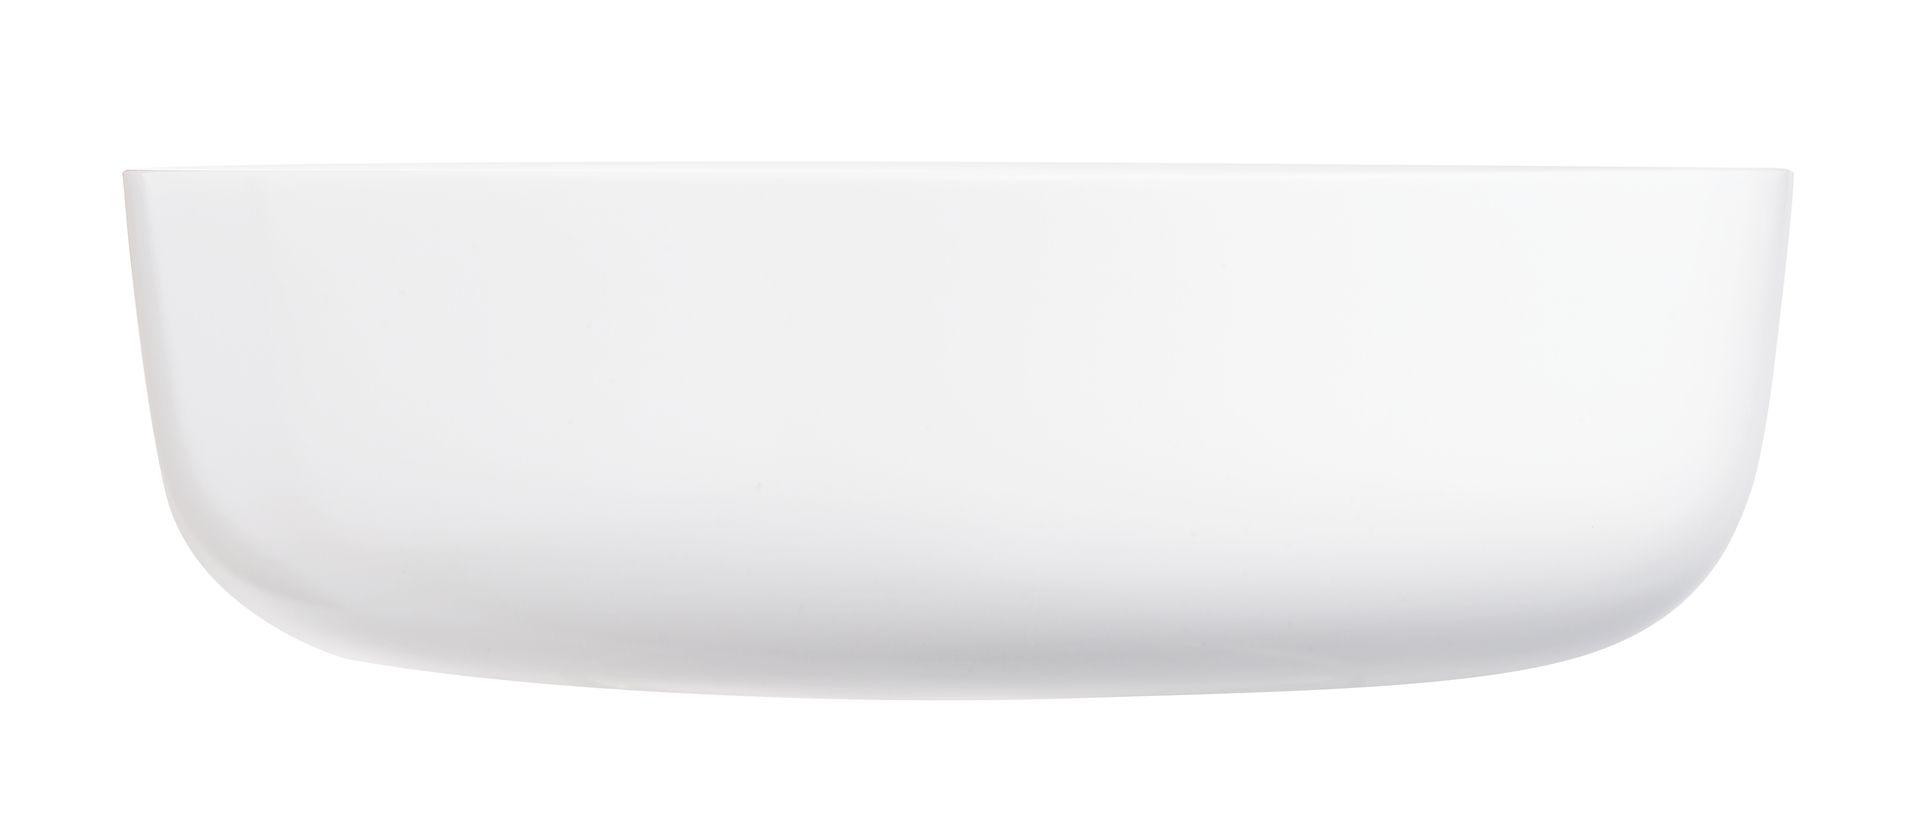 Travessa Refratária Diwali Vidro Branco 30cm 4L Luminarc